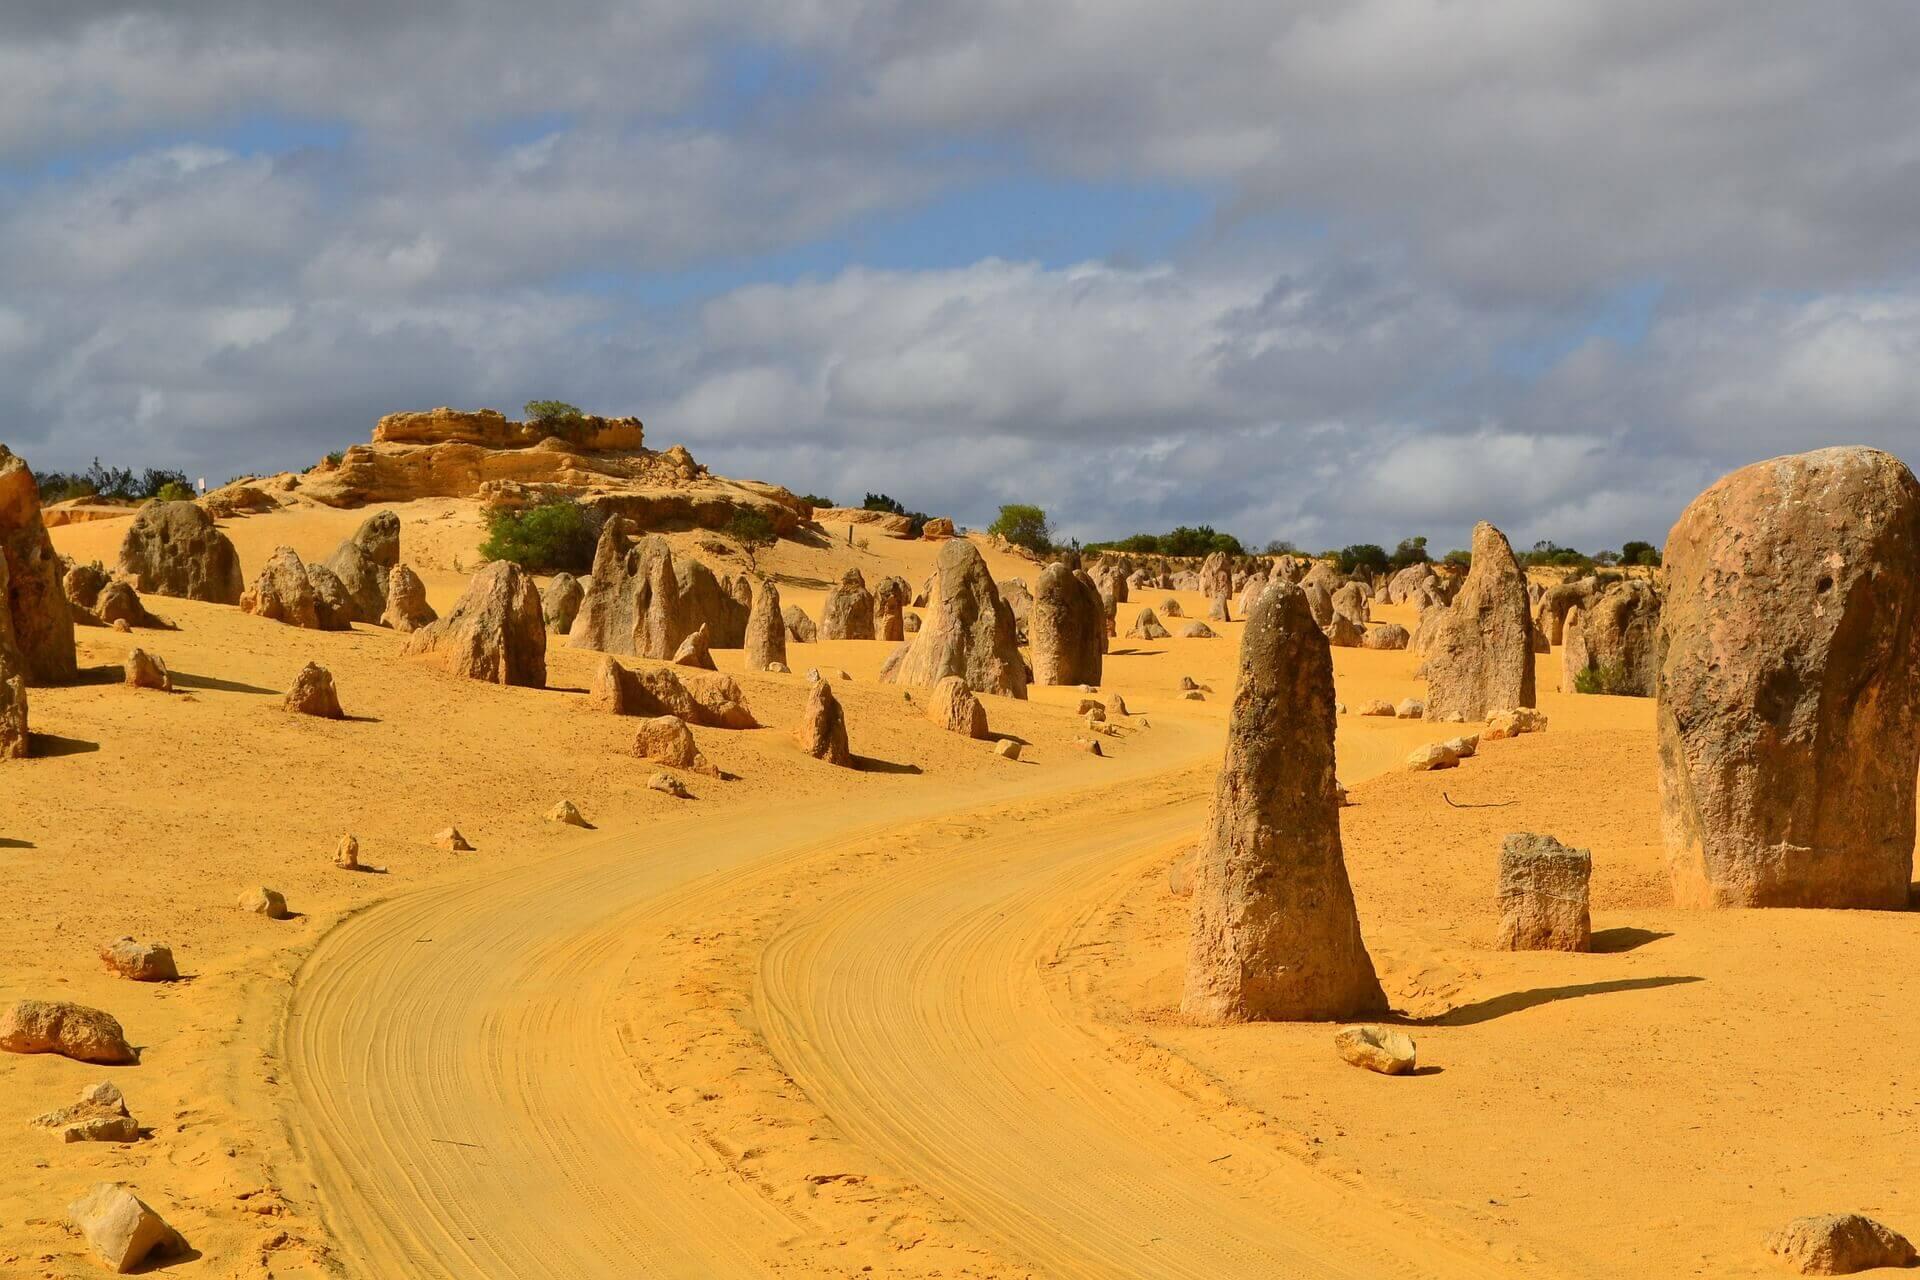 Perth rocks